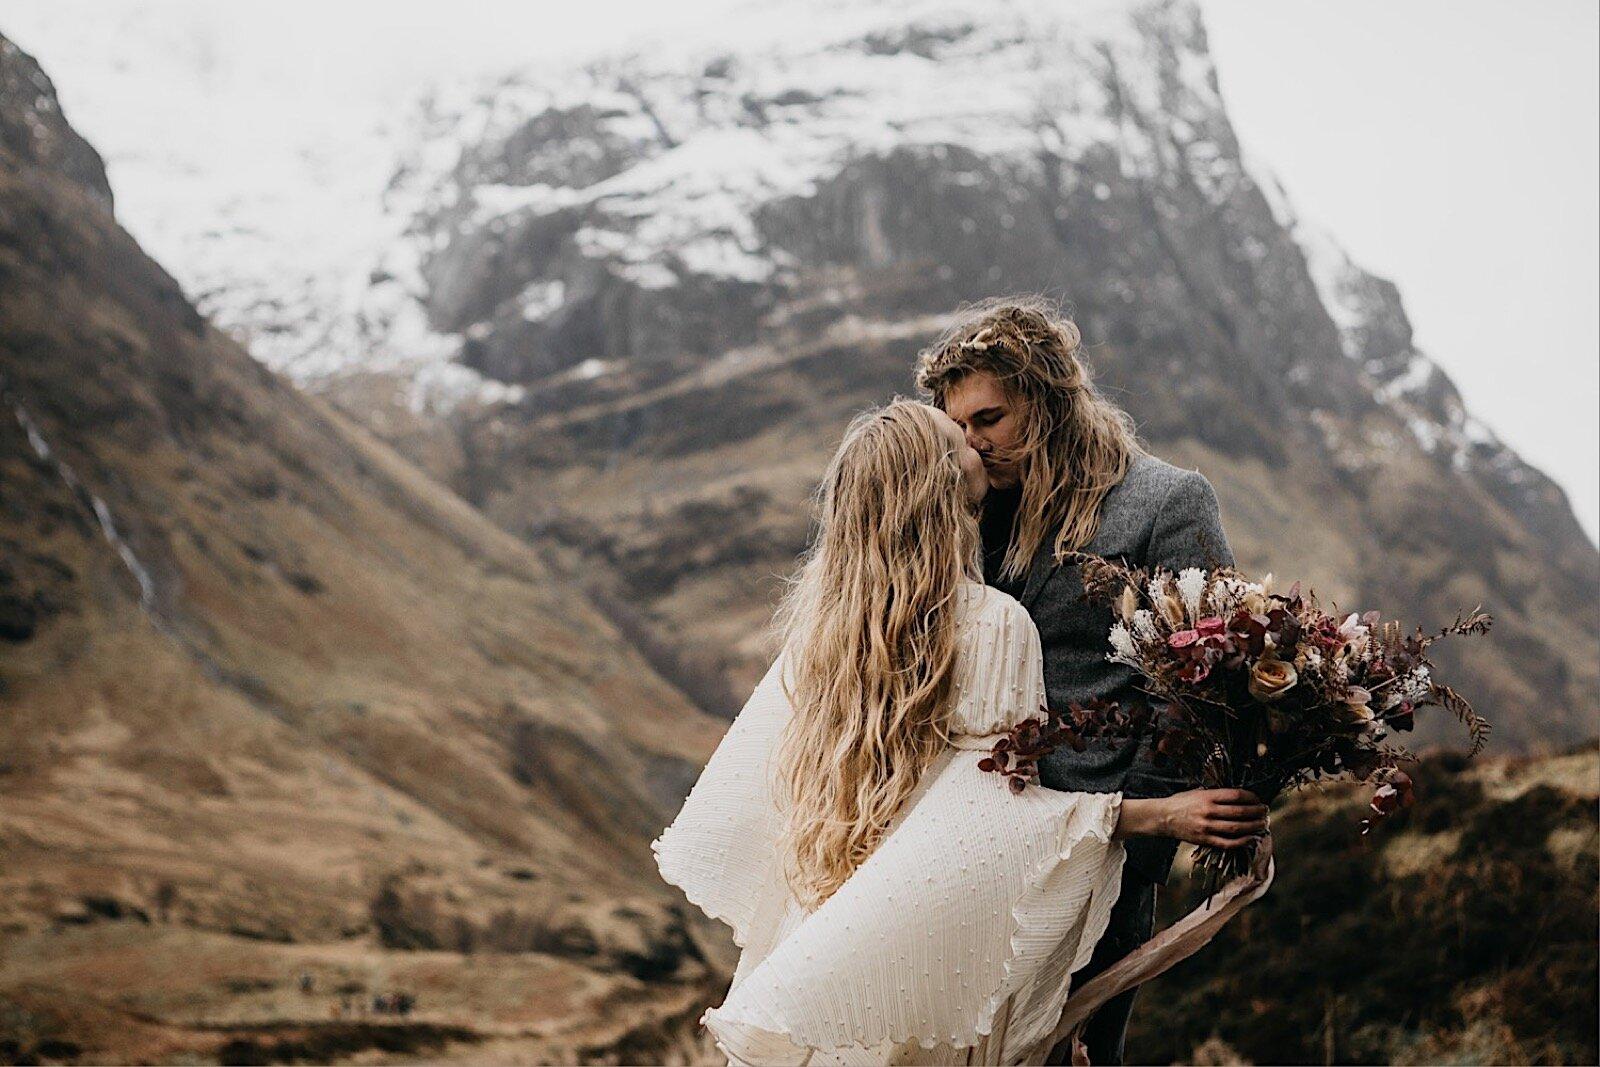 21_scotland_couple_shoot_lety_photography (29 von 39).jpg